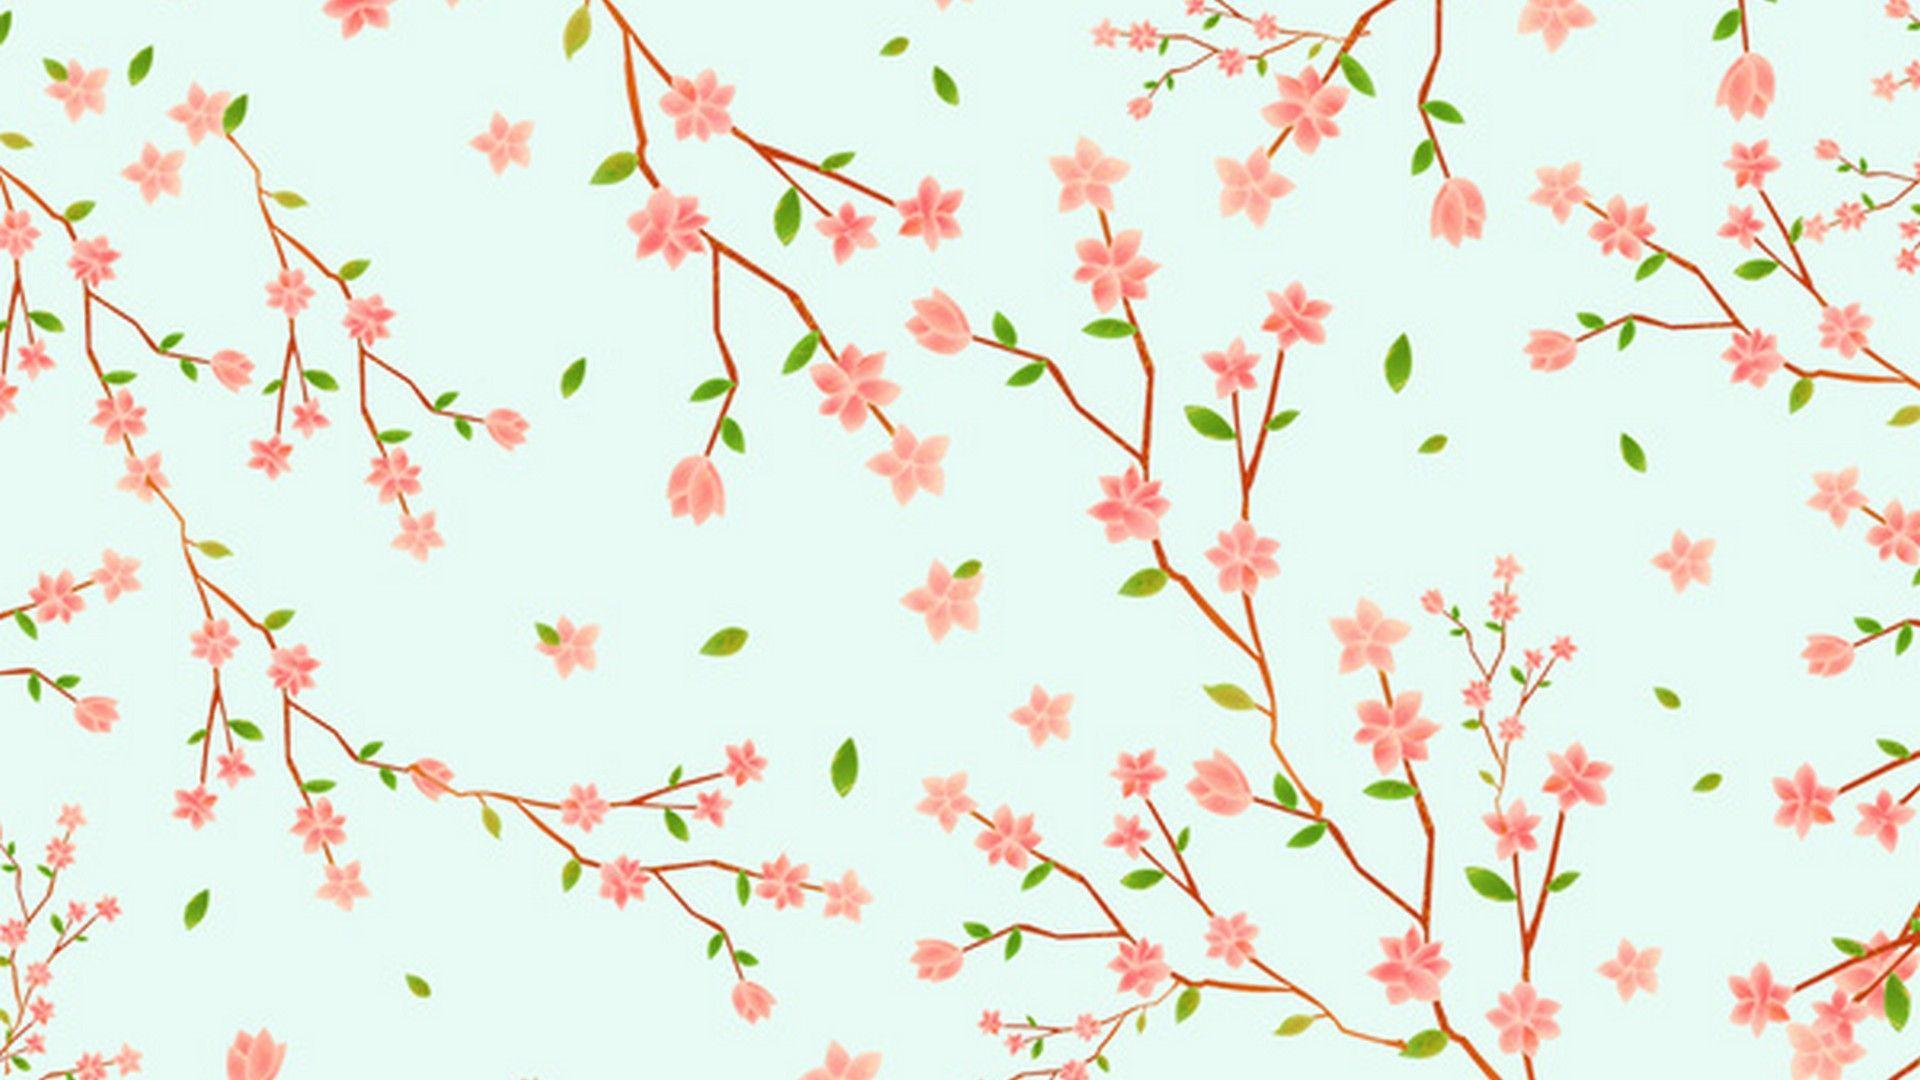 Springtime Desktop Backgrounds HD Best HD Wallpapers Cute 1920x1080